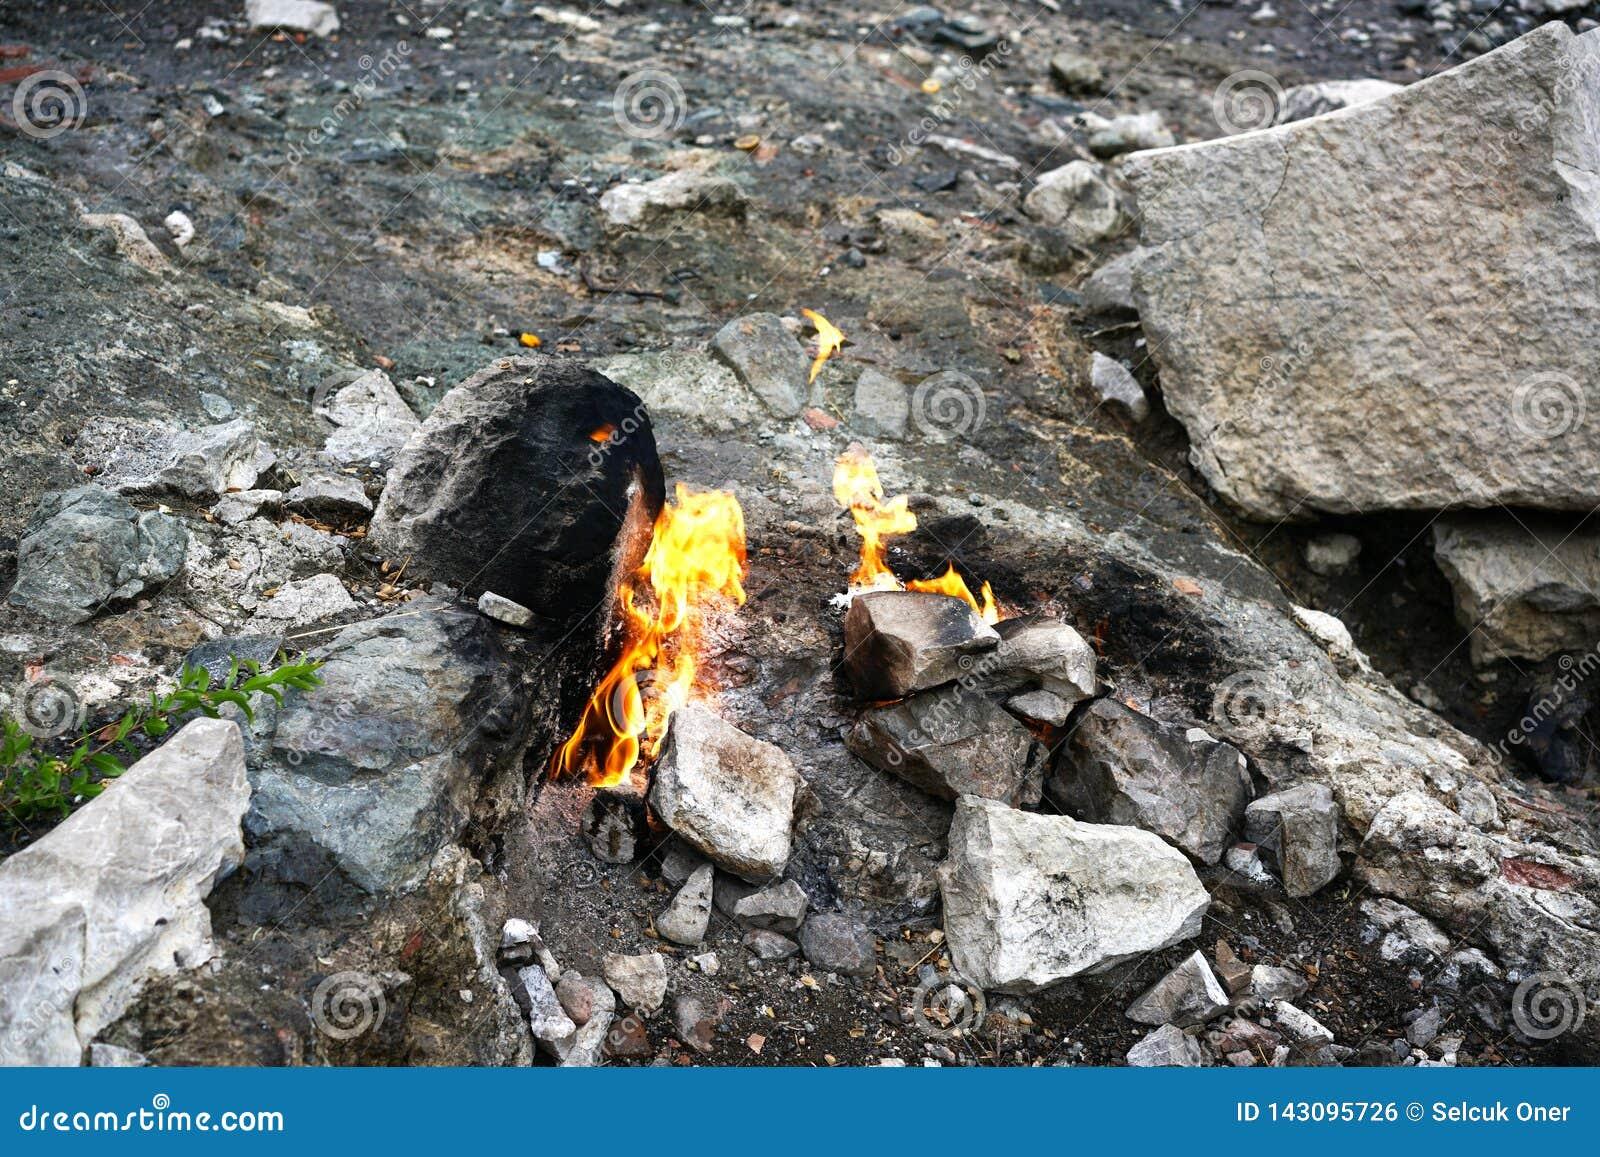 Chimera, burning rocks are remarkable spot ot the trail of Lycian way near Cirali, Antaly